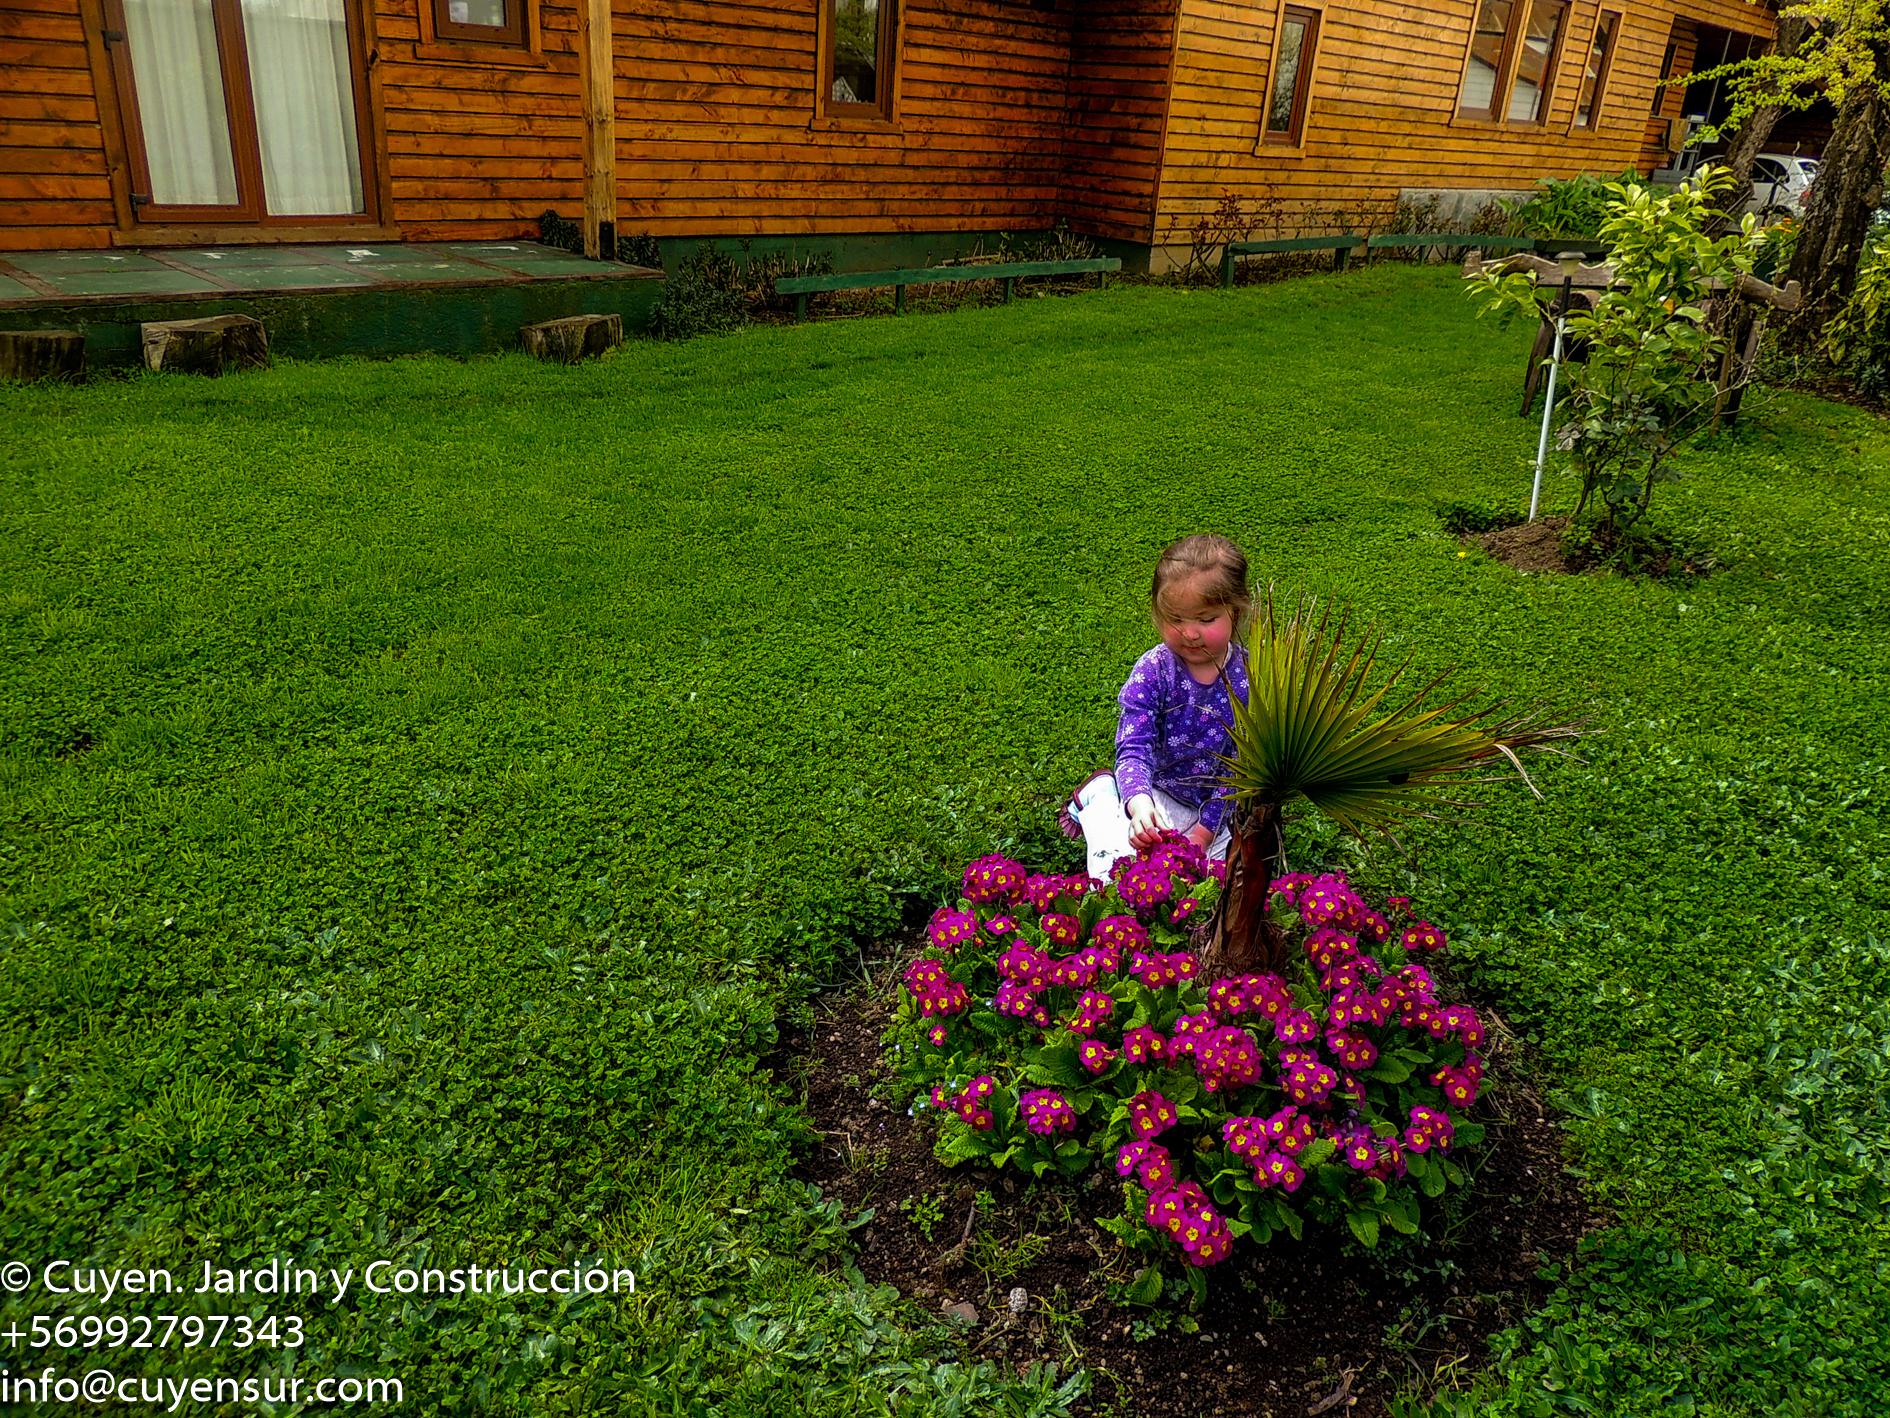 #patagonia_#surdechile_#lagoranco_#jardín_#paisajismo_#diseño_#futrono_#cuencadelranco-9